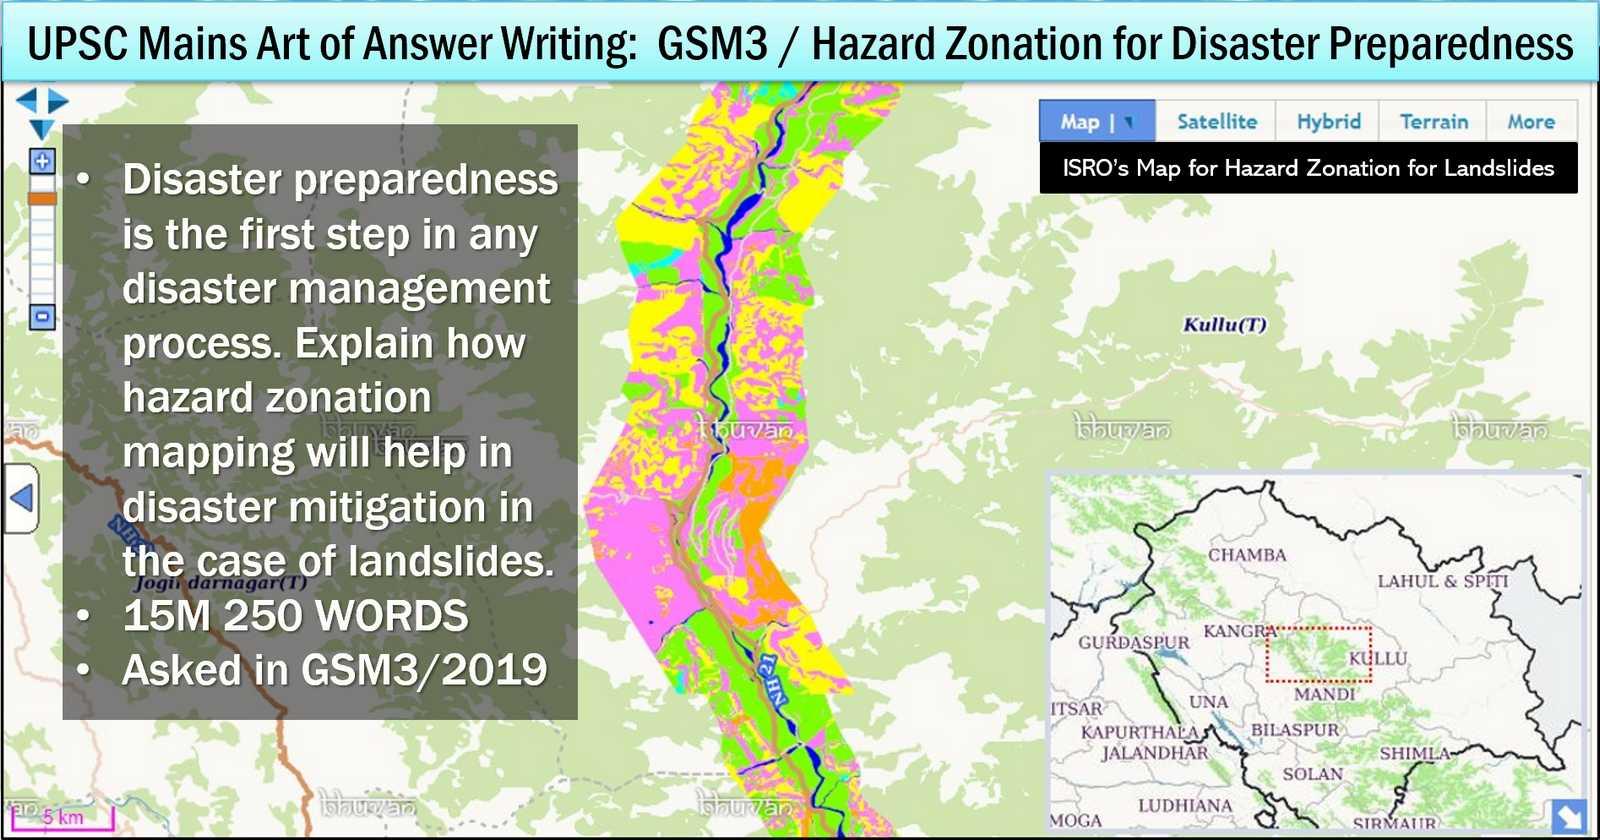 UPSC Mains Model Answer Writing Framework for hazard zonation mapping for landslides